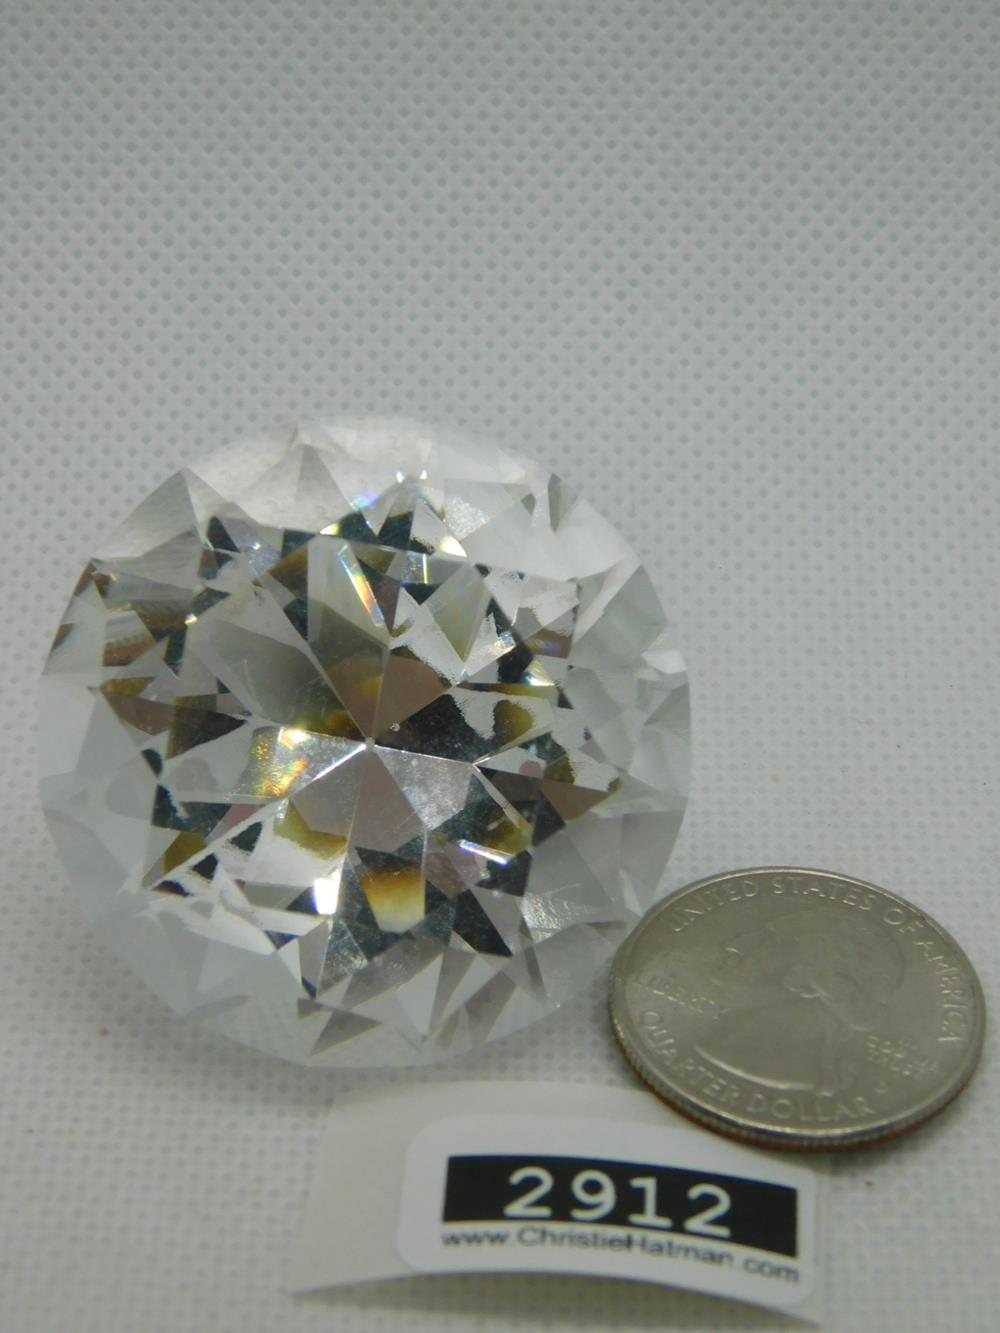 CRYSTAL DISPLAY DIAMOND